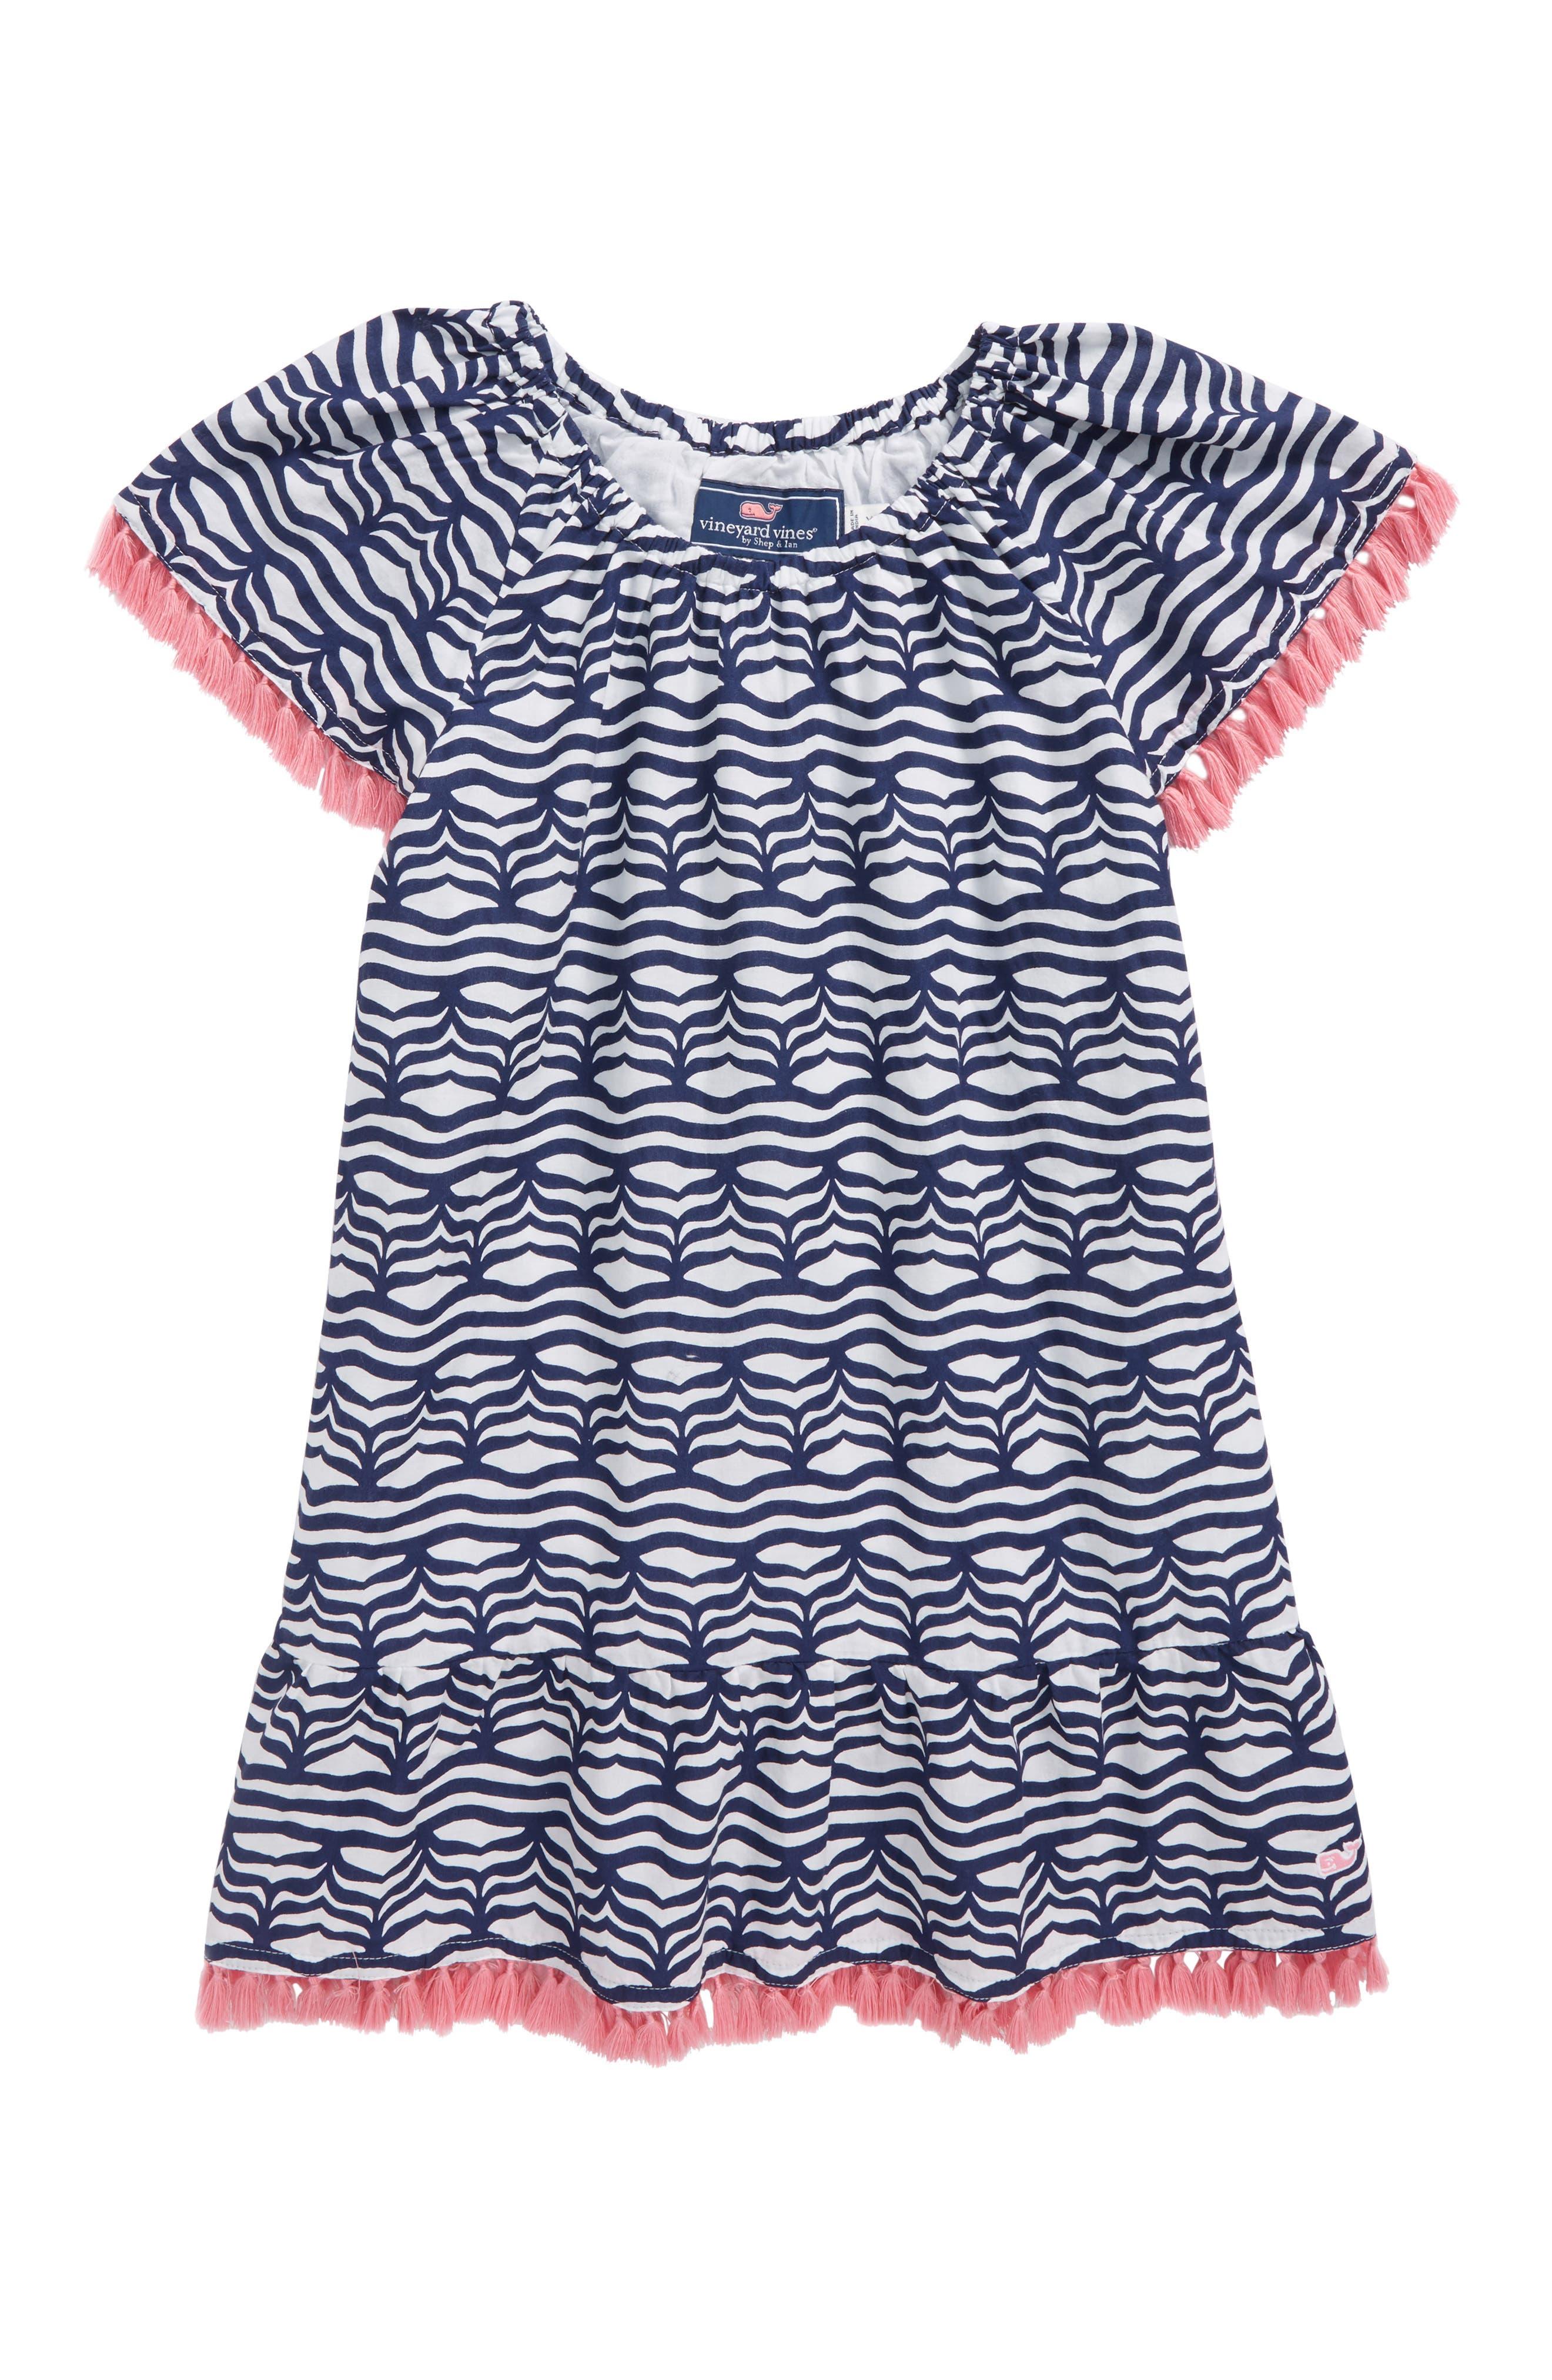 Whale Tail Wave Dress,                             Main thumbnail 1, color,                             400